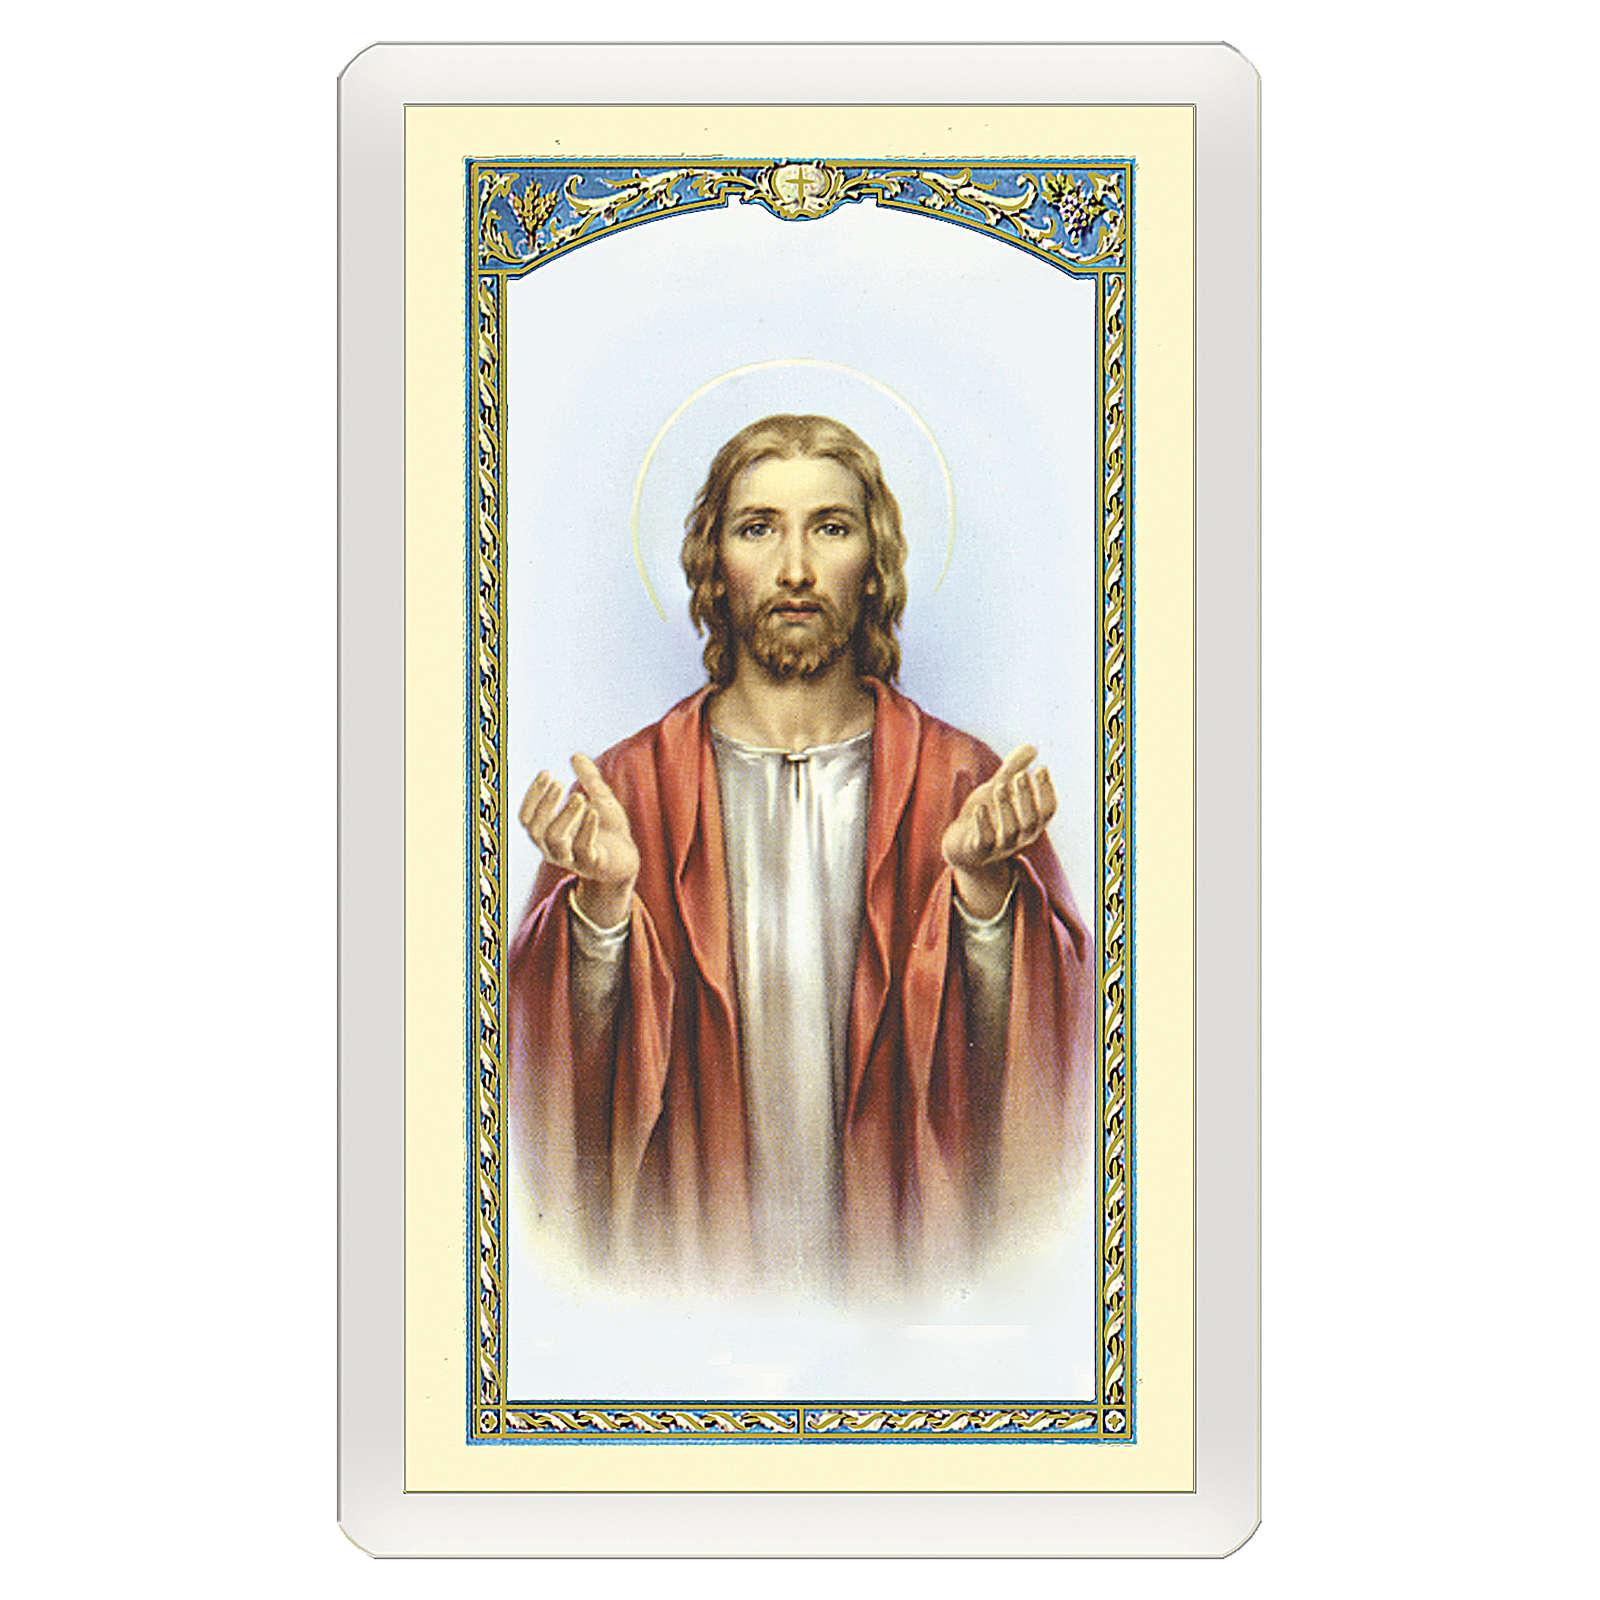 Santino Gesù Benedicente Padre Nostro ITA 10x5 4